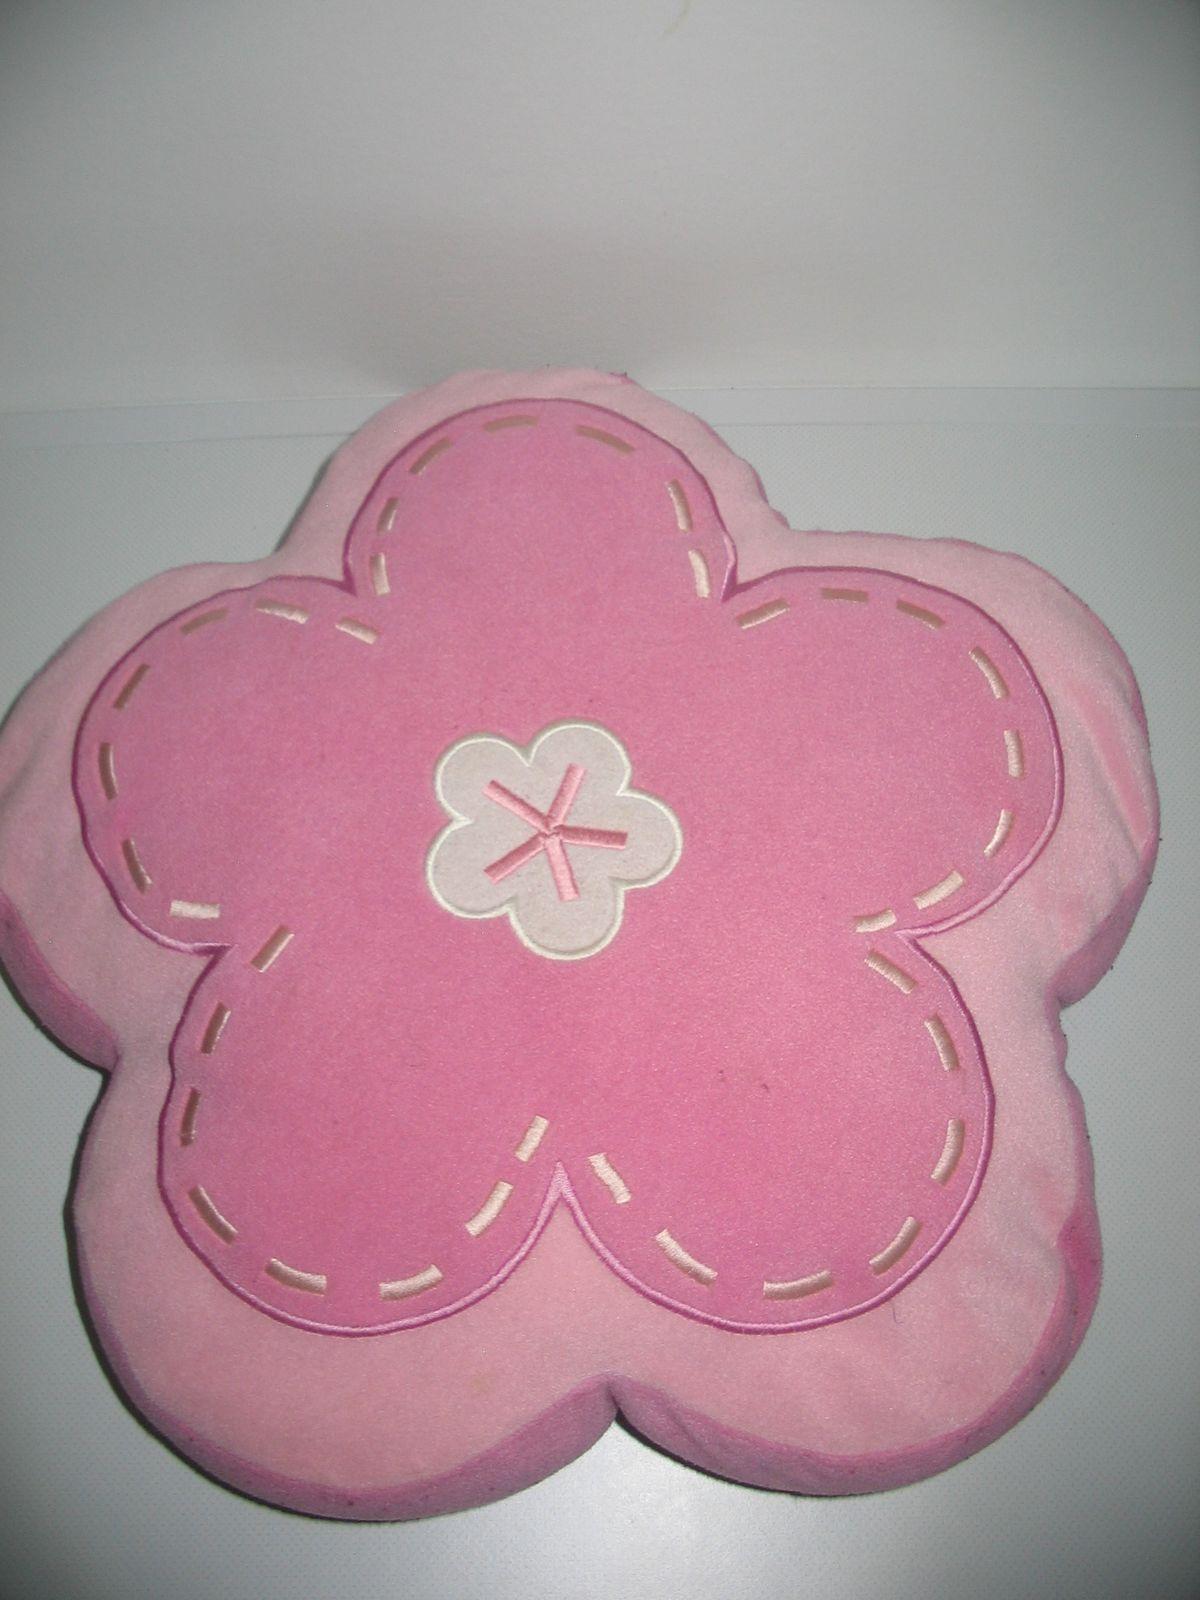 ... Virág formájú rózsaszín-lila kétoldalú plüss párna 490e84f3fb